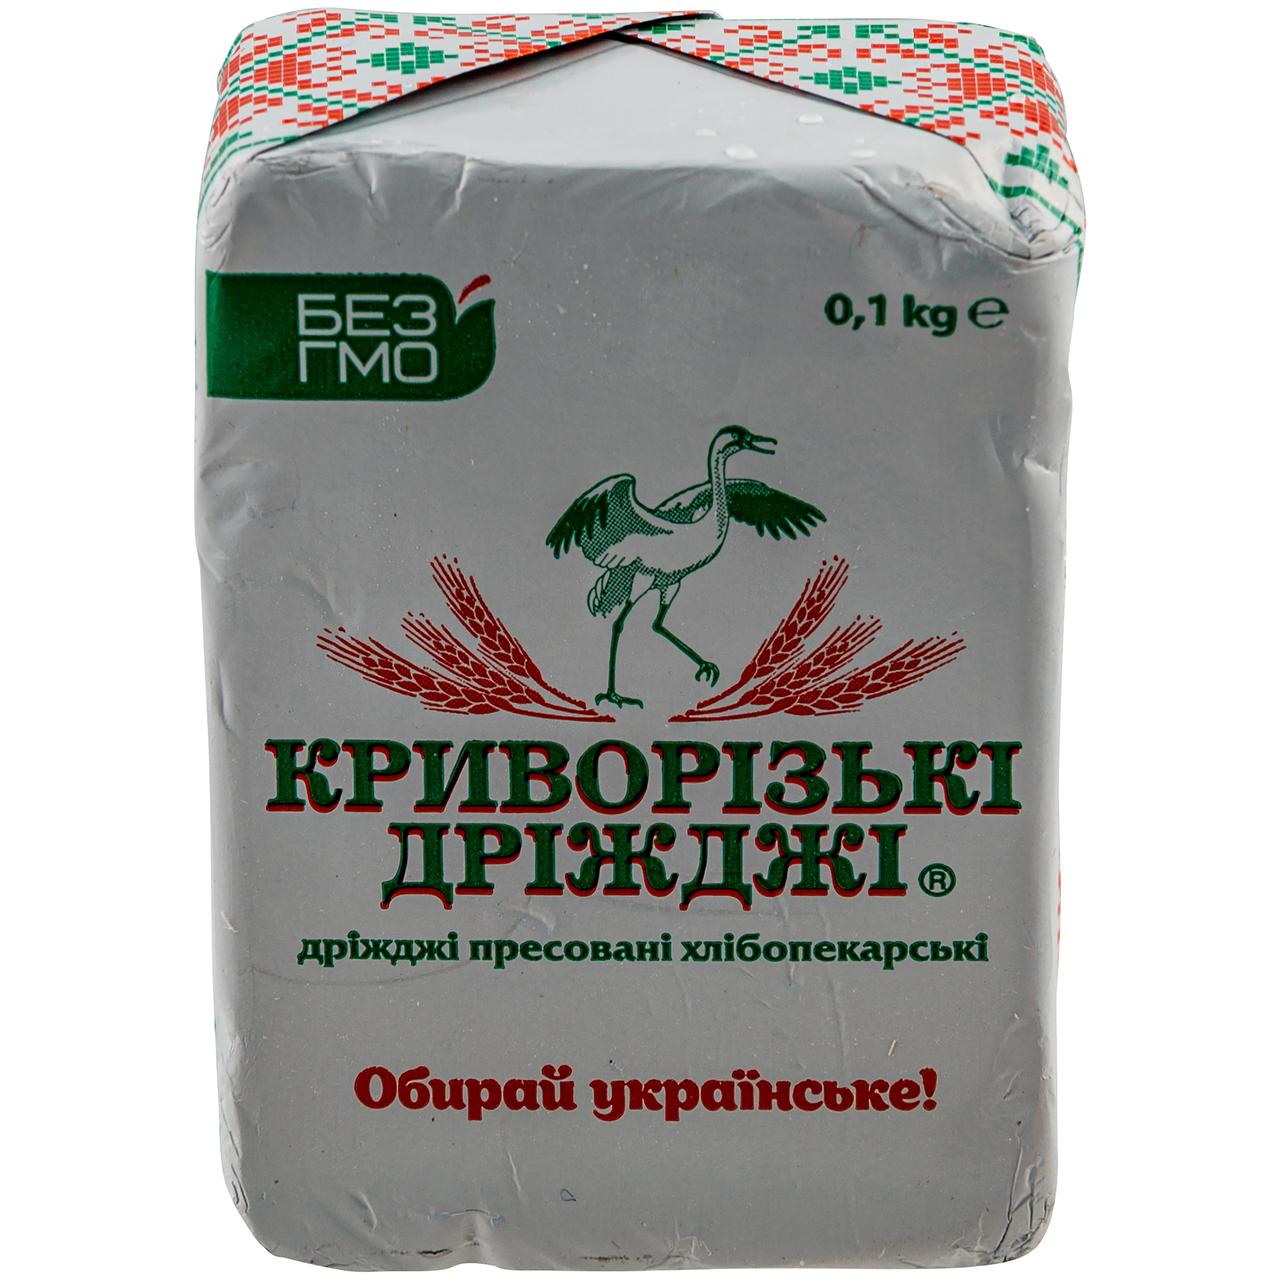 Дріжджі Криворізькі Дріжджі пресовані хлібопекарські 0.1кг